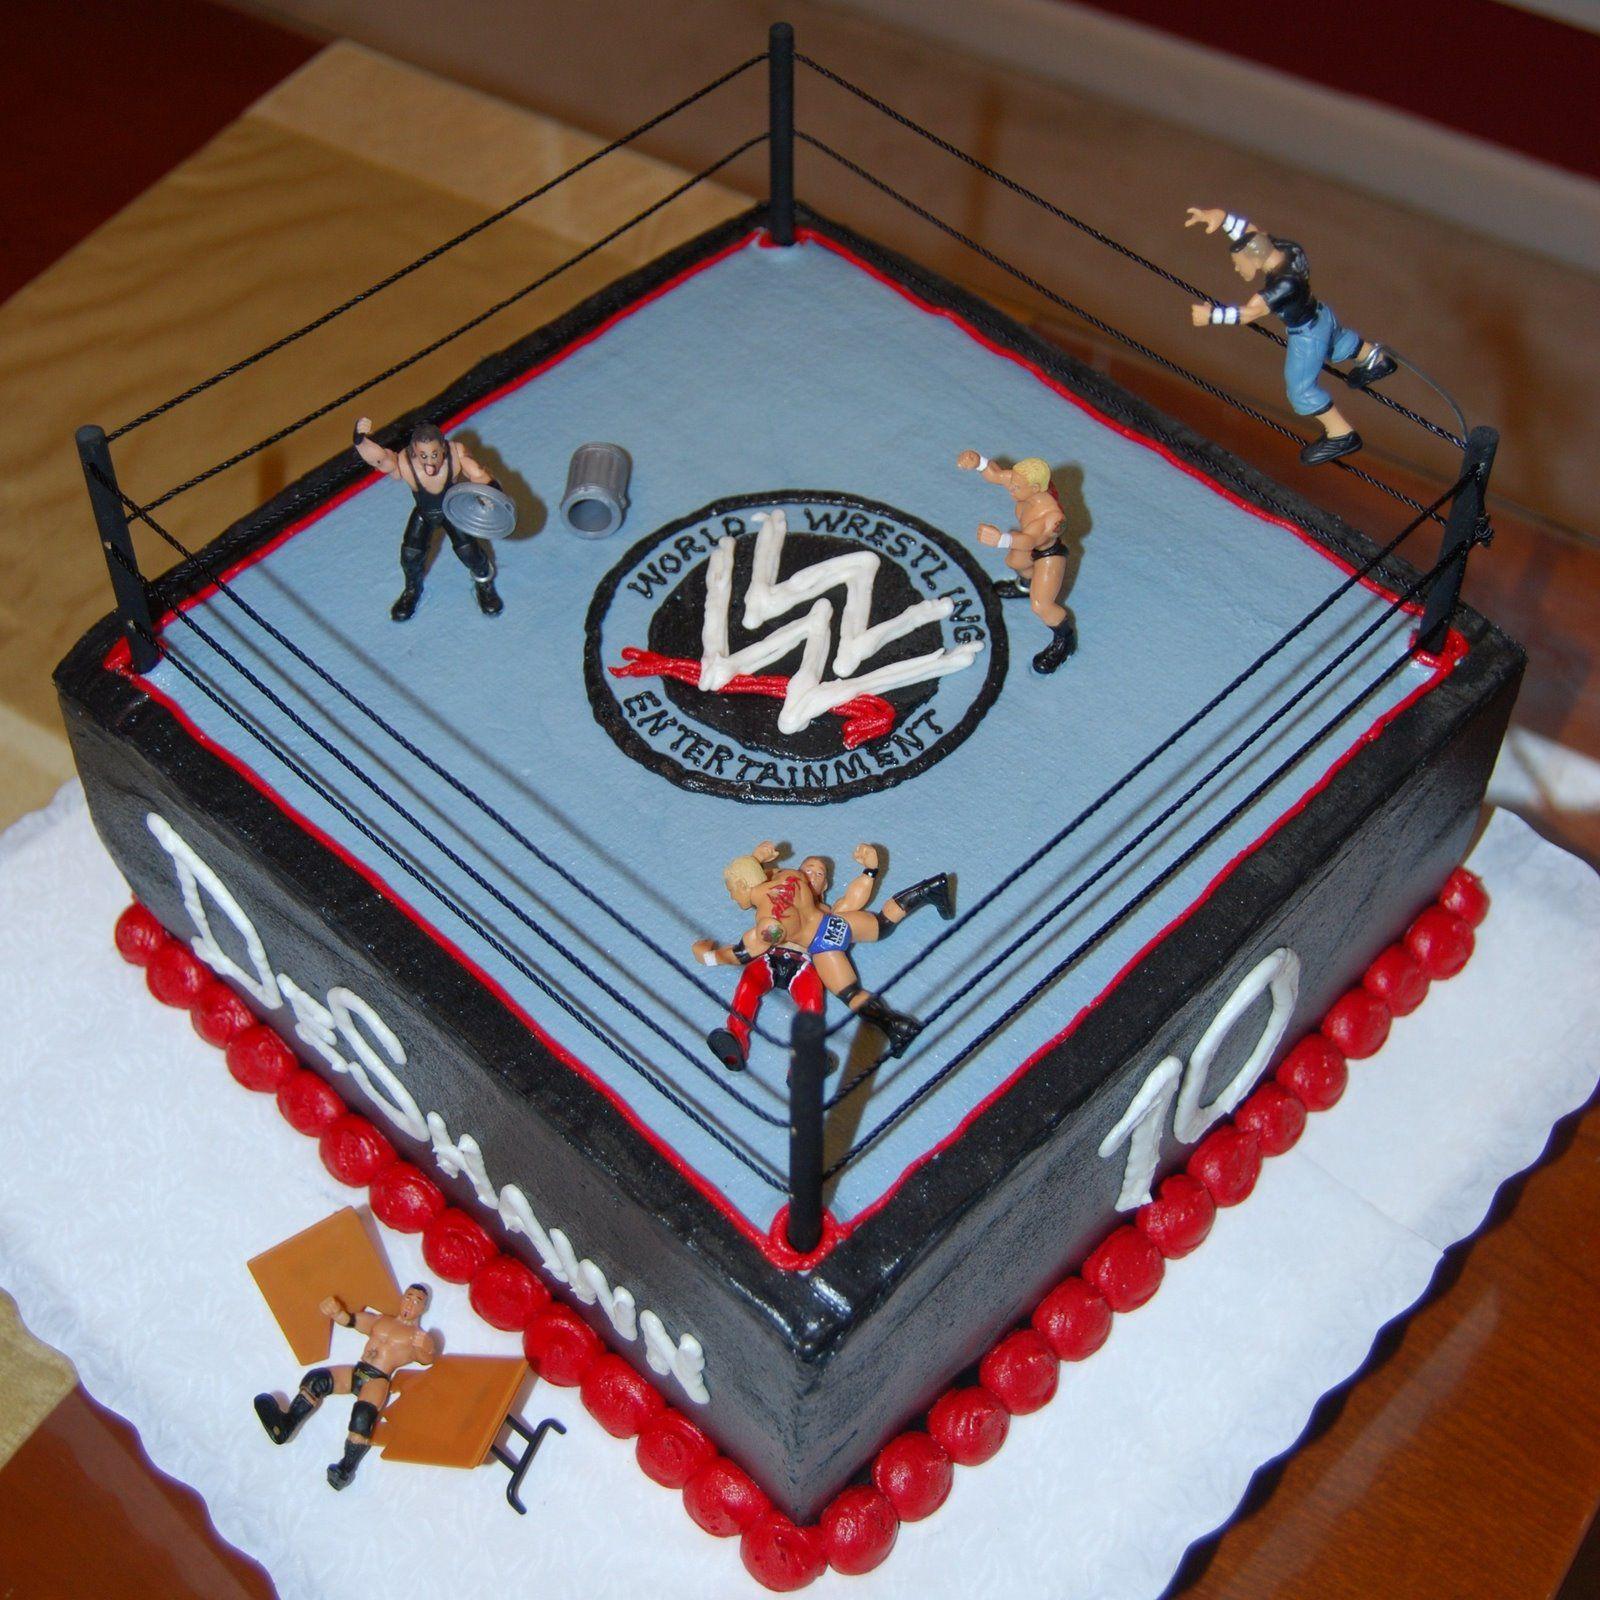 Wwe Wrestling Cake Com Imagens Aniversario Ideias Aniversario